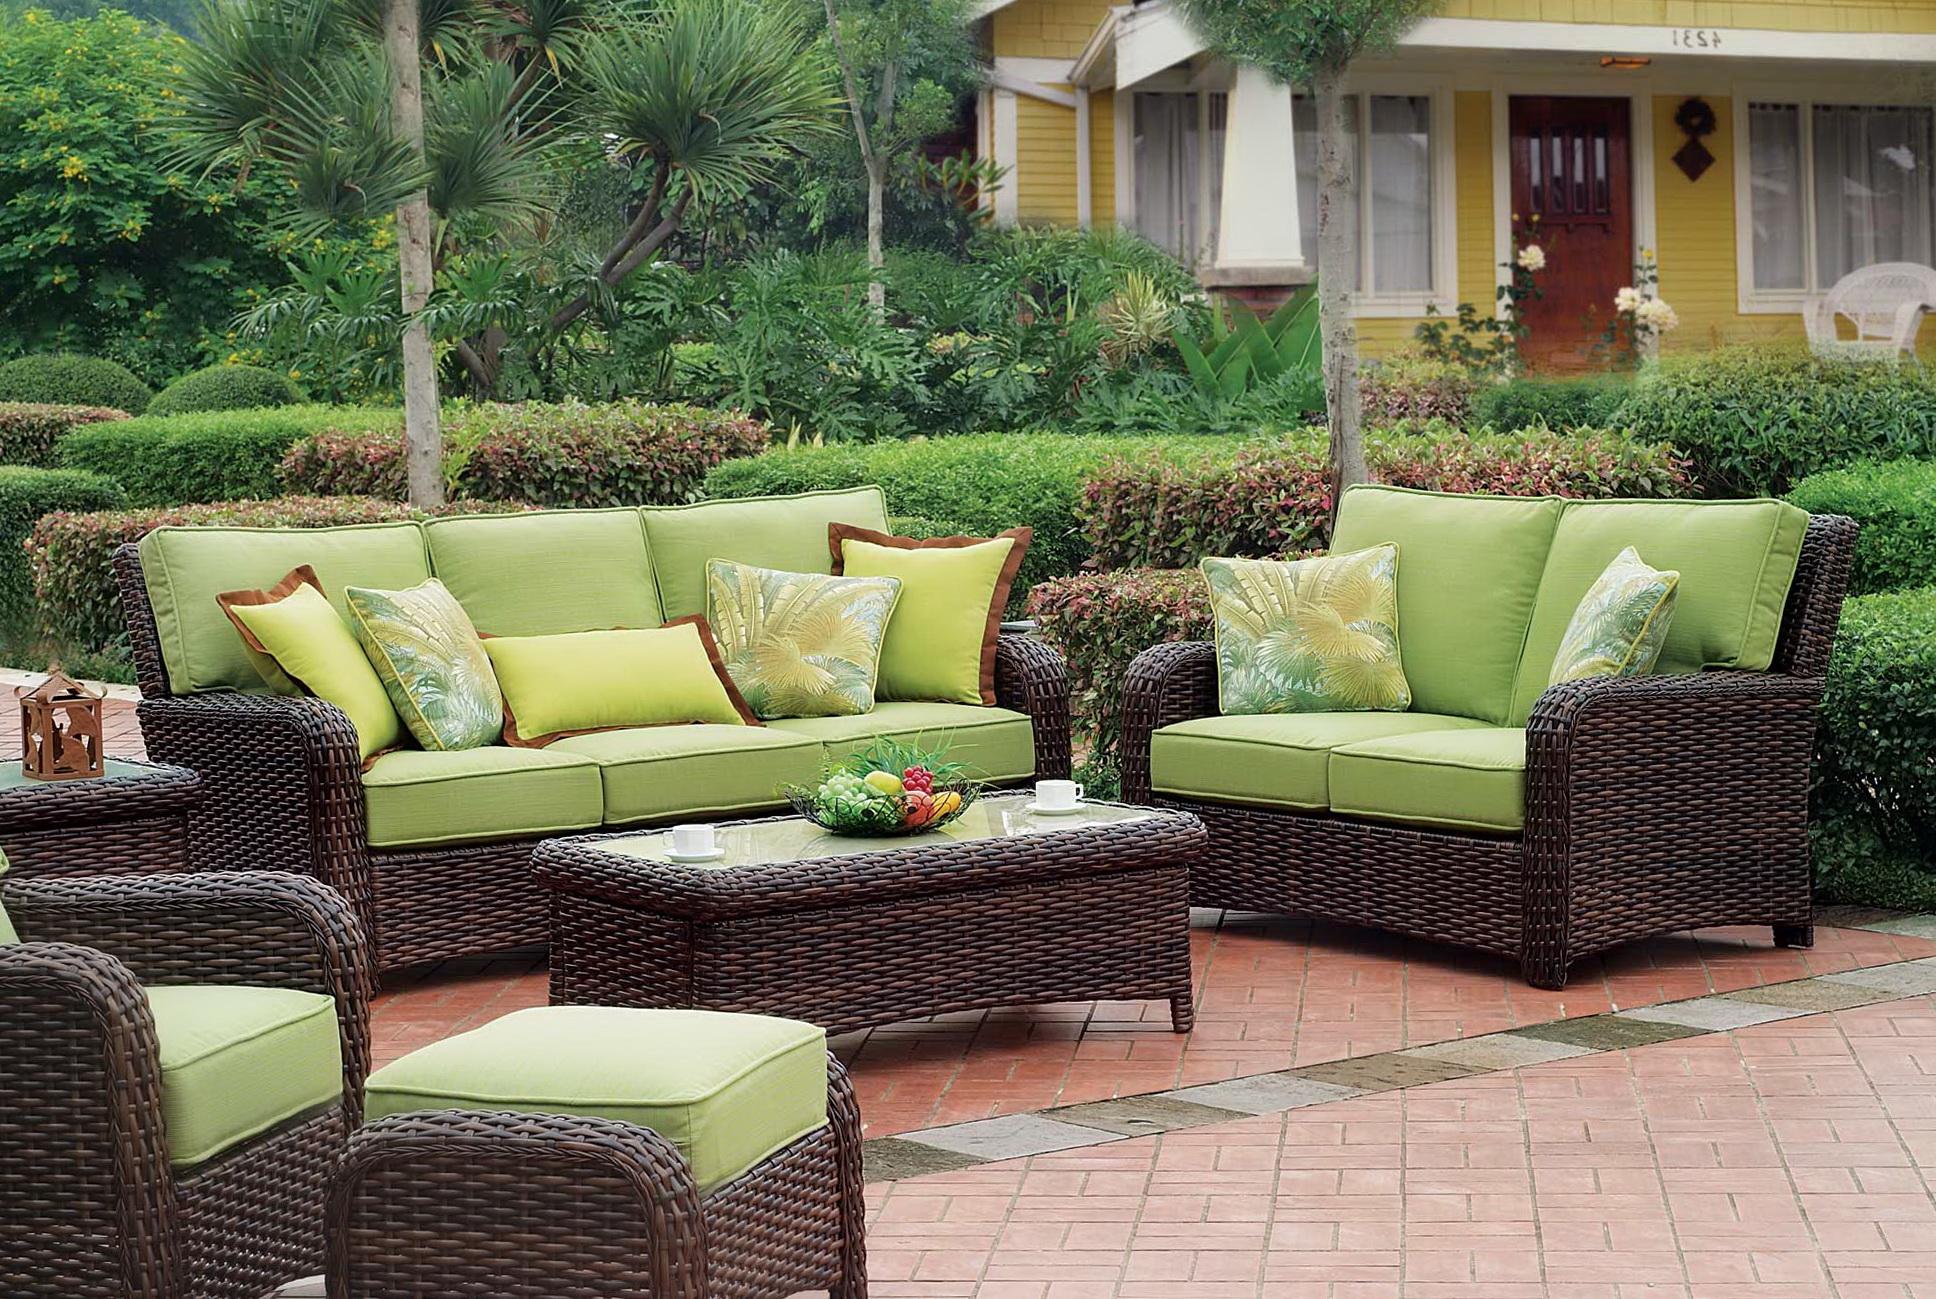 Wicker Furniture Cushions Clearance Home Design Ideas